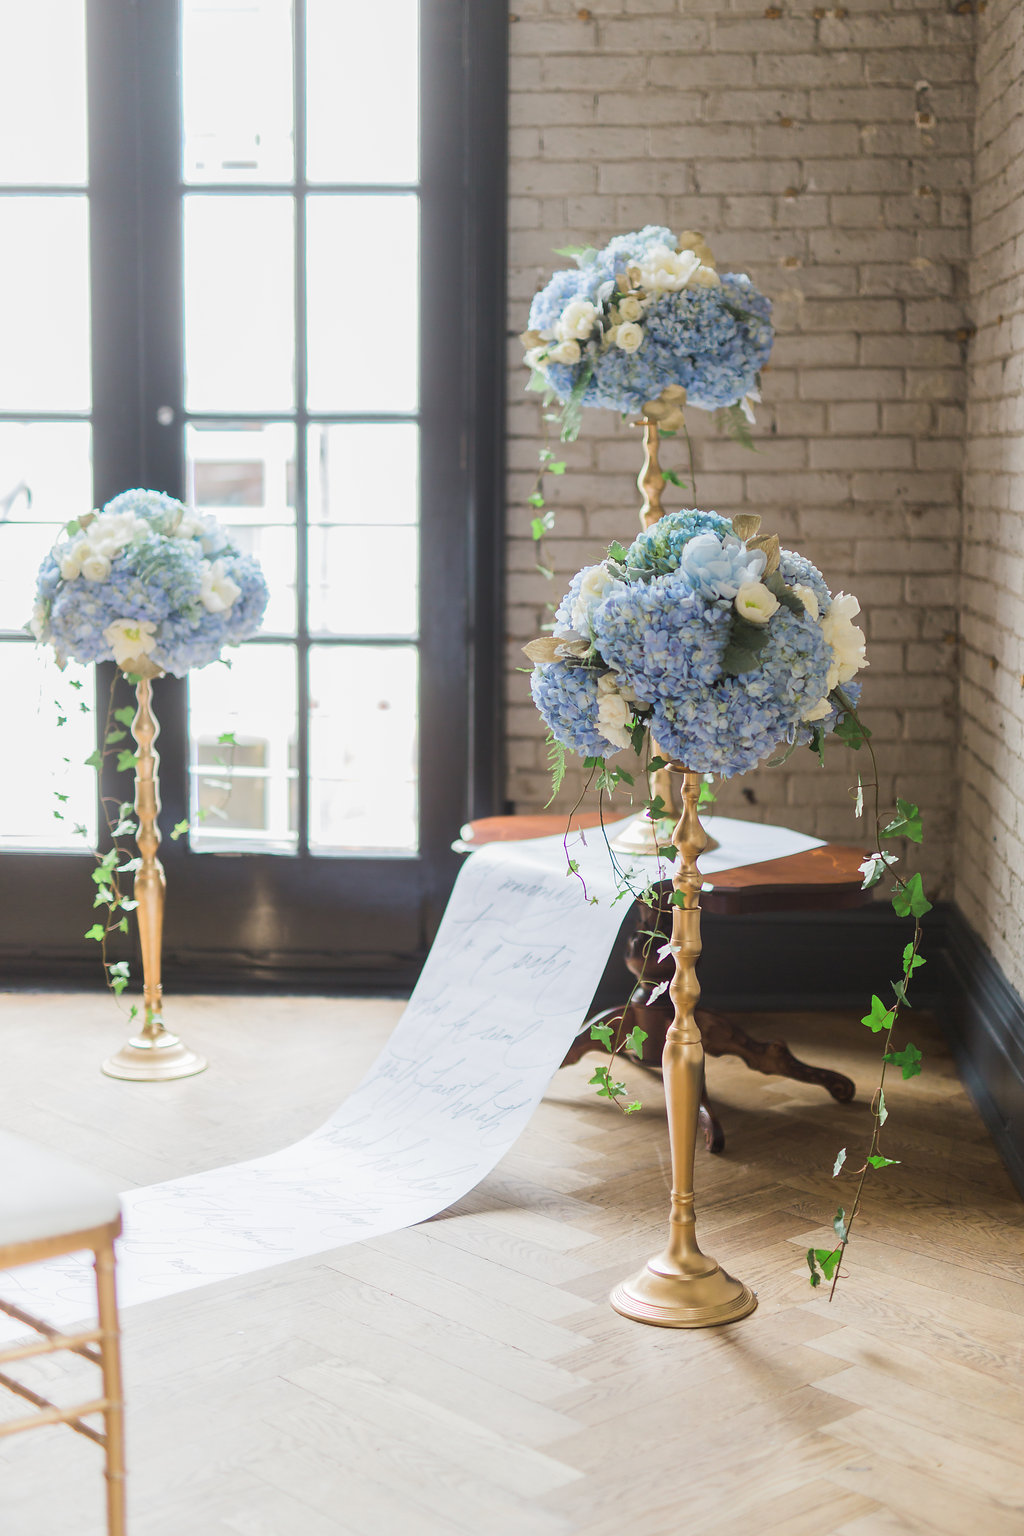 Phoebe Lo Events Toronto Wedding - Storys Building Urban Loft Paper Inspired Wedding 007.jpg